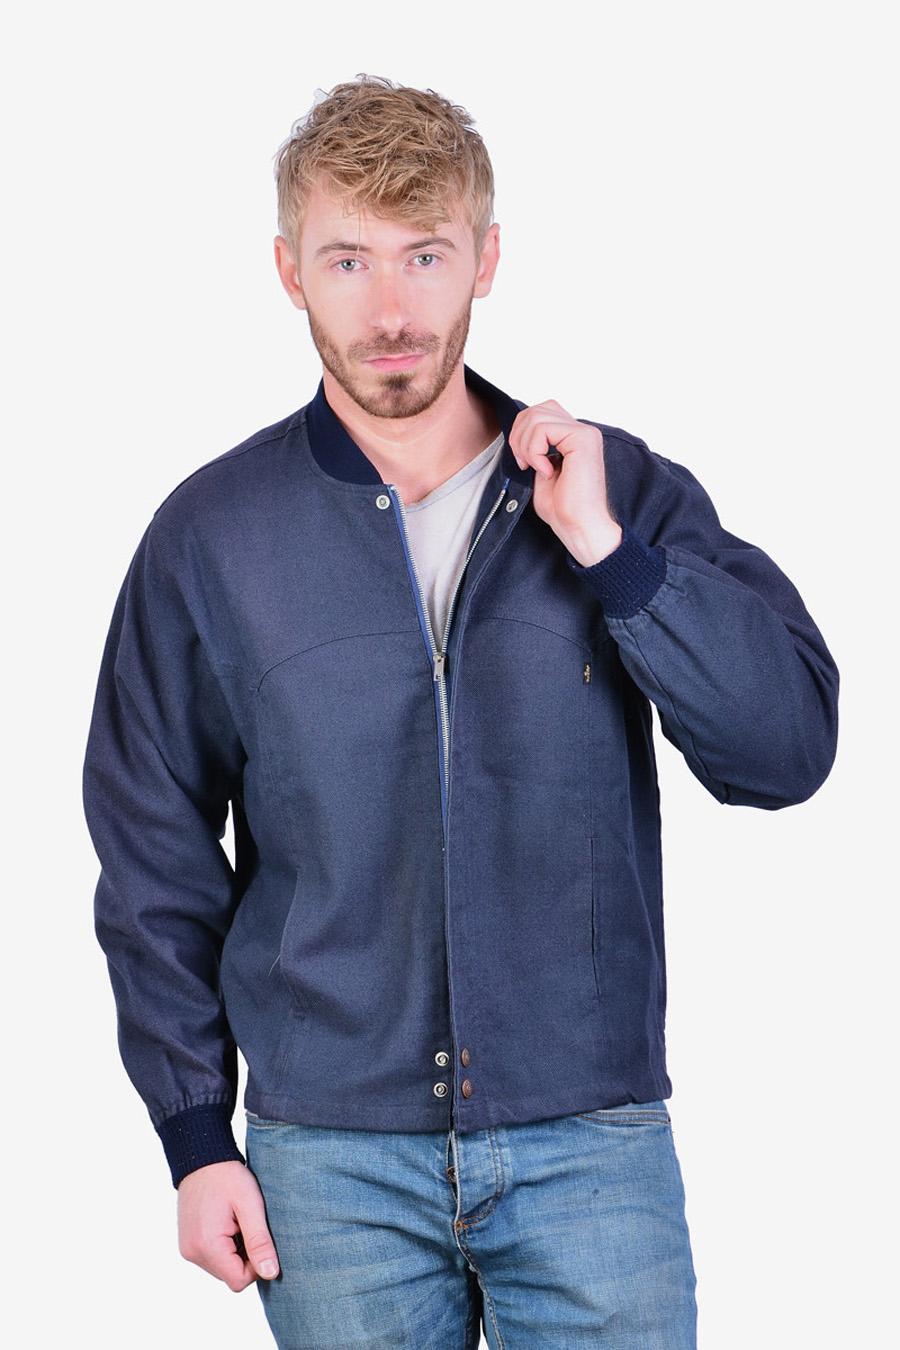 Vintage Levi's Sta-Prest jacket